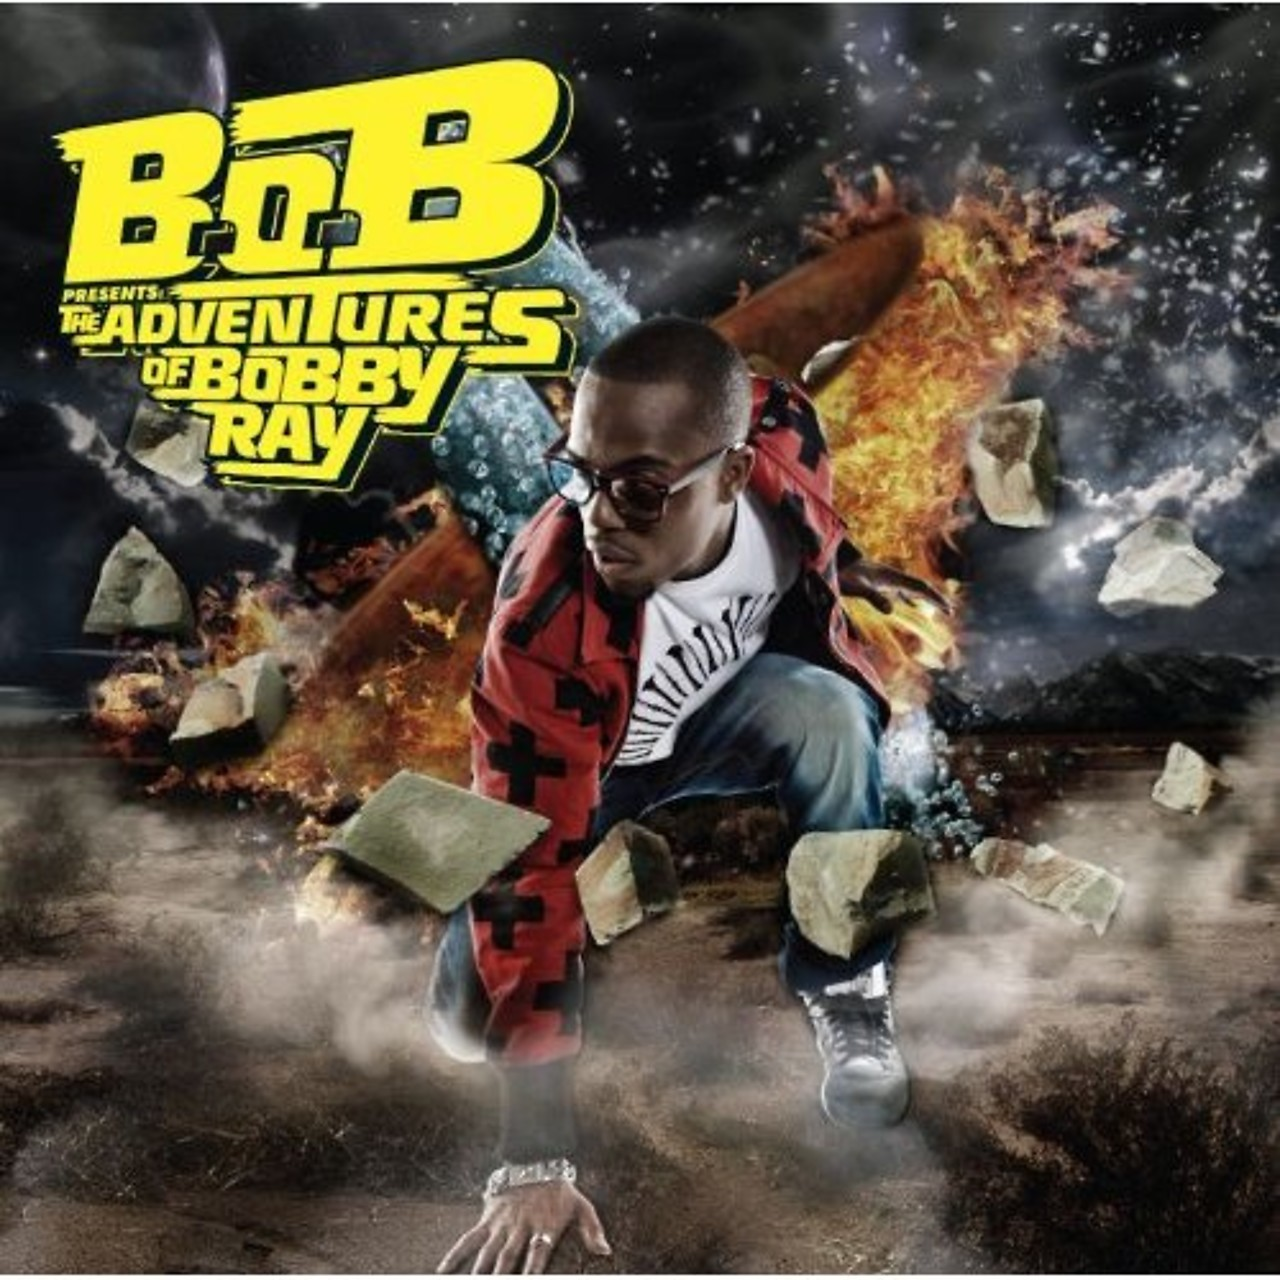 B o B Presents: The Adventures of Bobby Ray by B o B